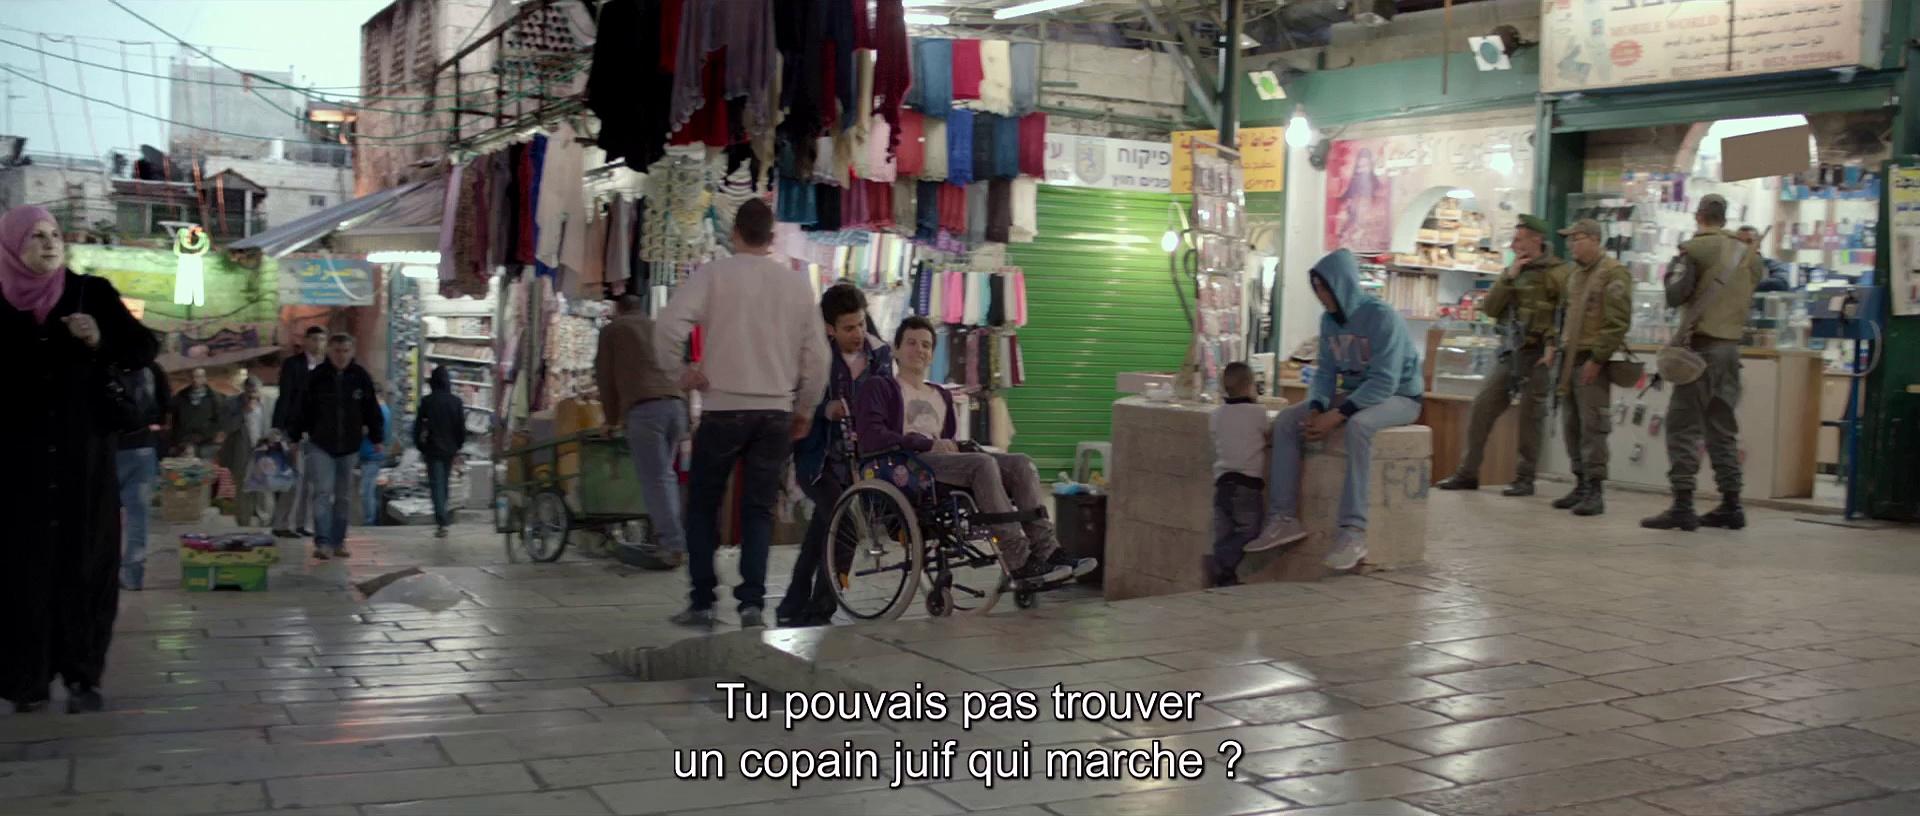 Dancing Arabs / Mon Fils (2015) – Arabic Trailer (french subtitles)